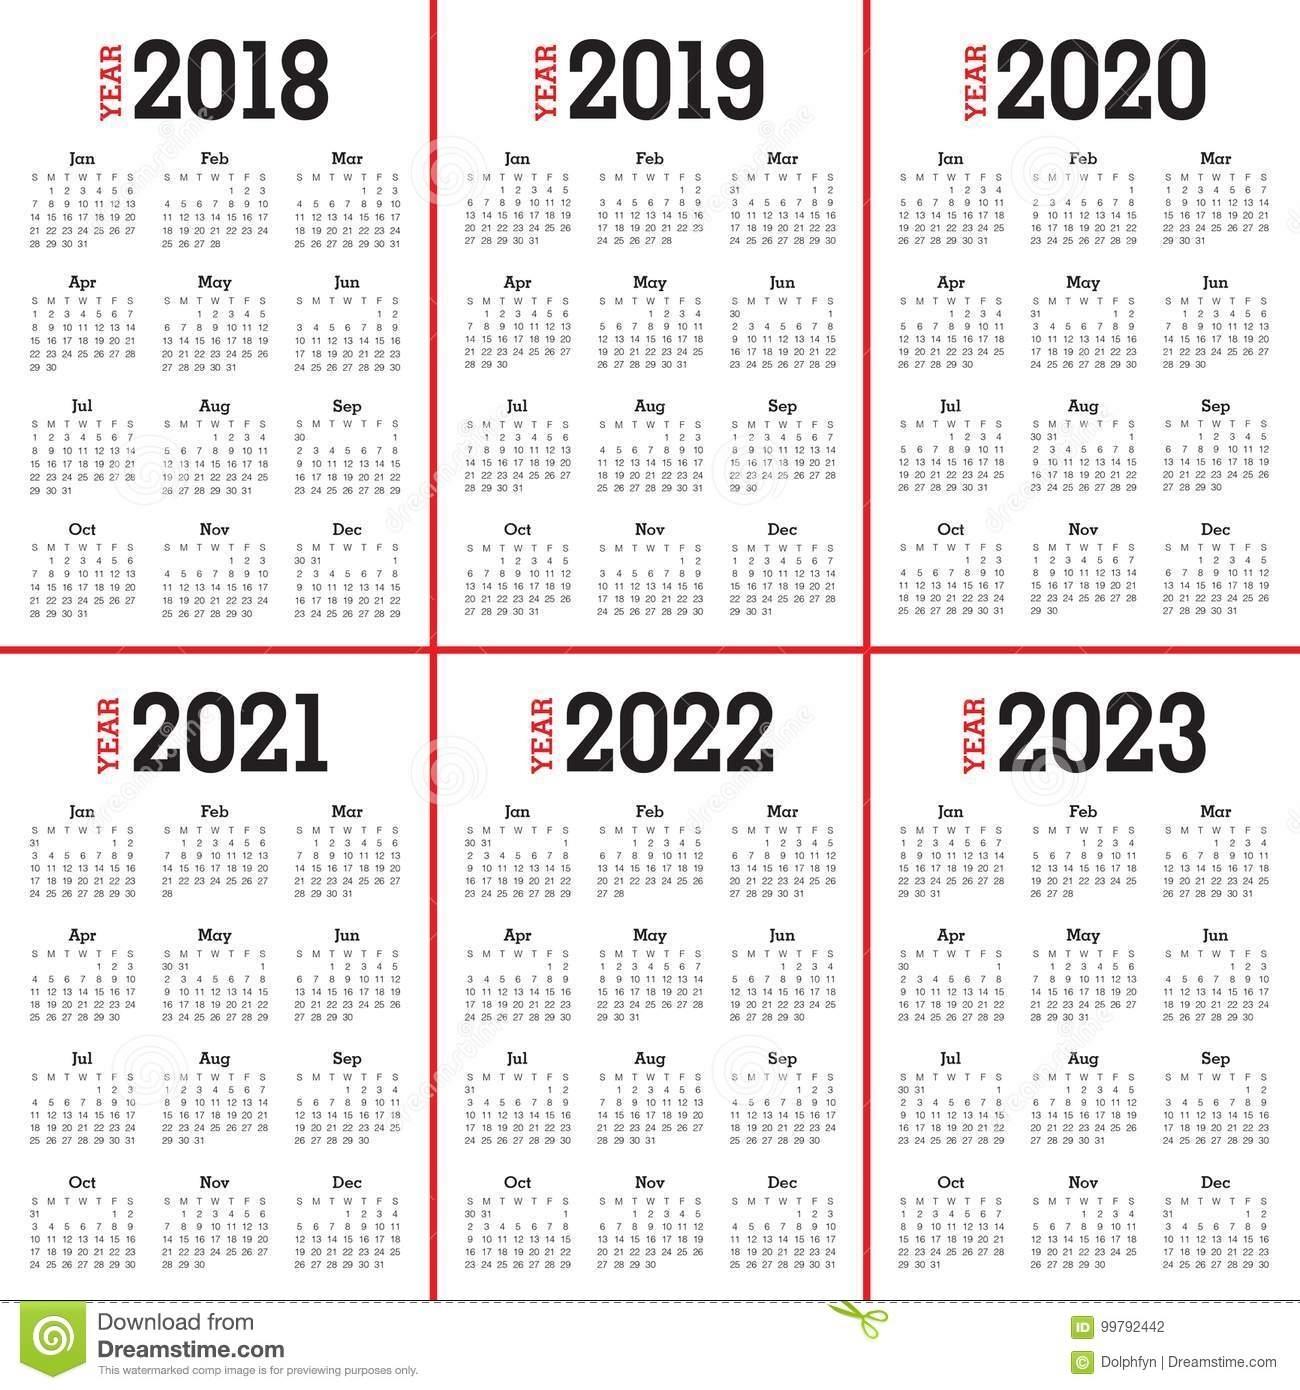 Printable Calendar For 2019/2020/2021/2022/2023 - Calendar